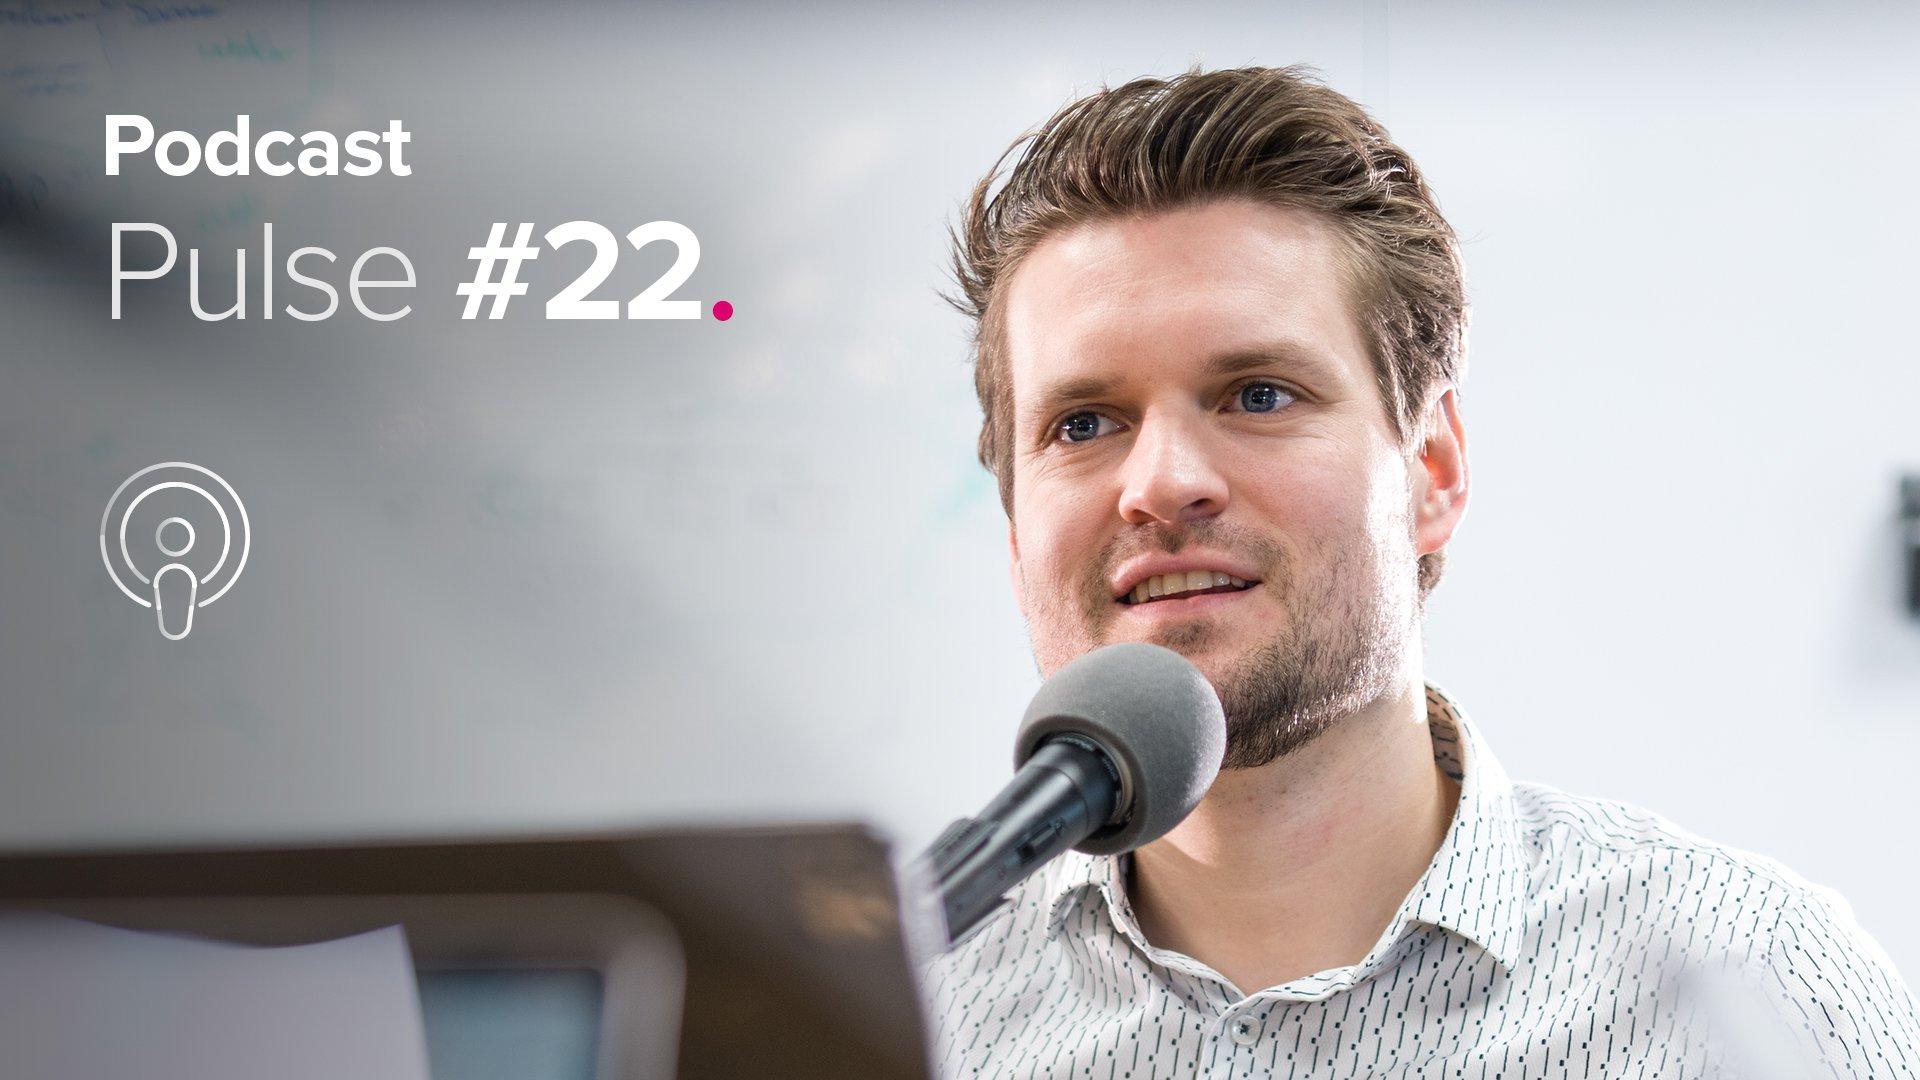 Podcast Digital Brains Pulse #22